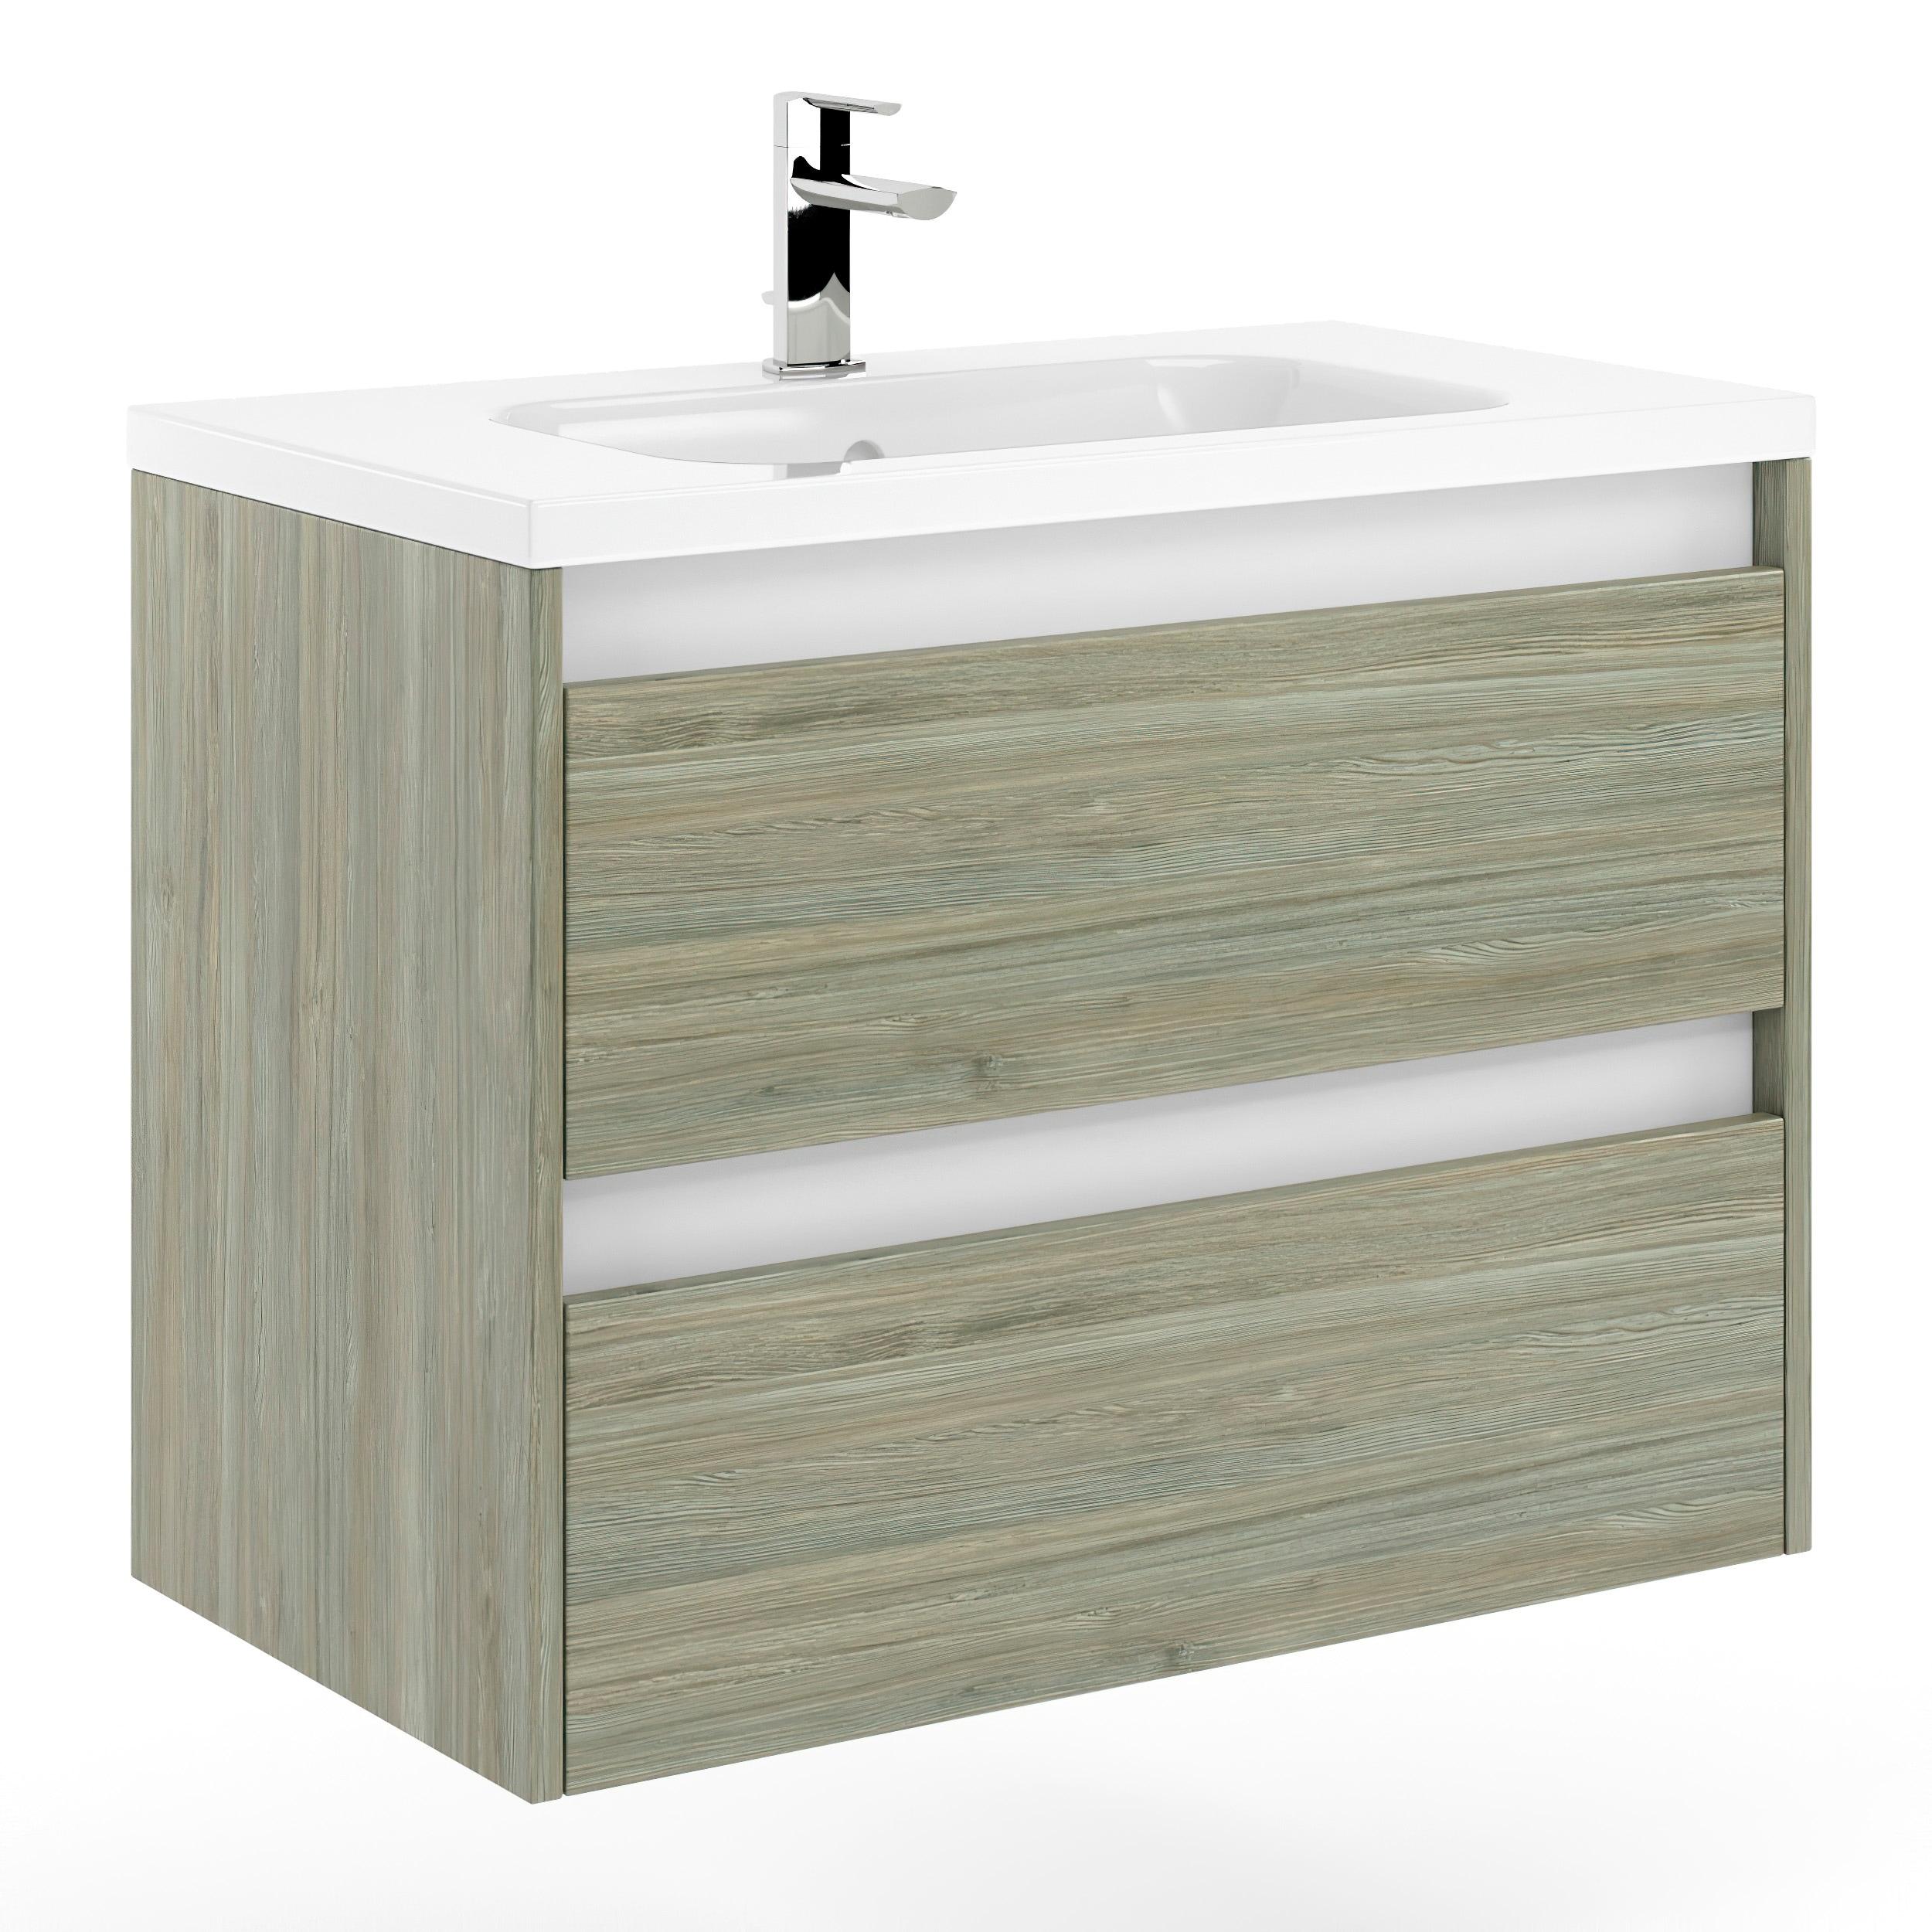 32 Bathroom Vanity Cabinet Sink Docce W32 X H35 X D18 In Sahalie Pine Wood On Sale Overstock 32159777